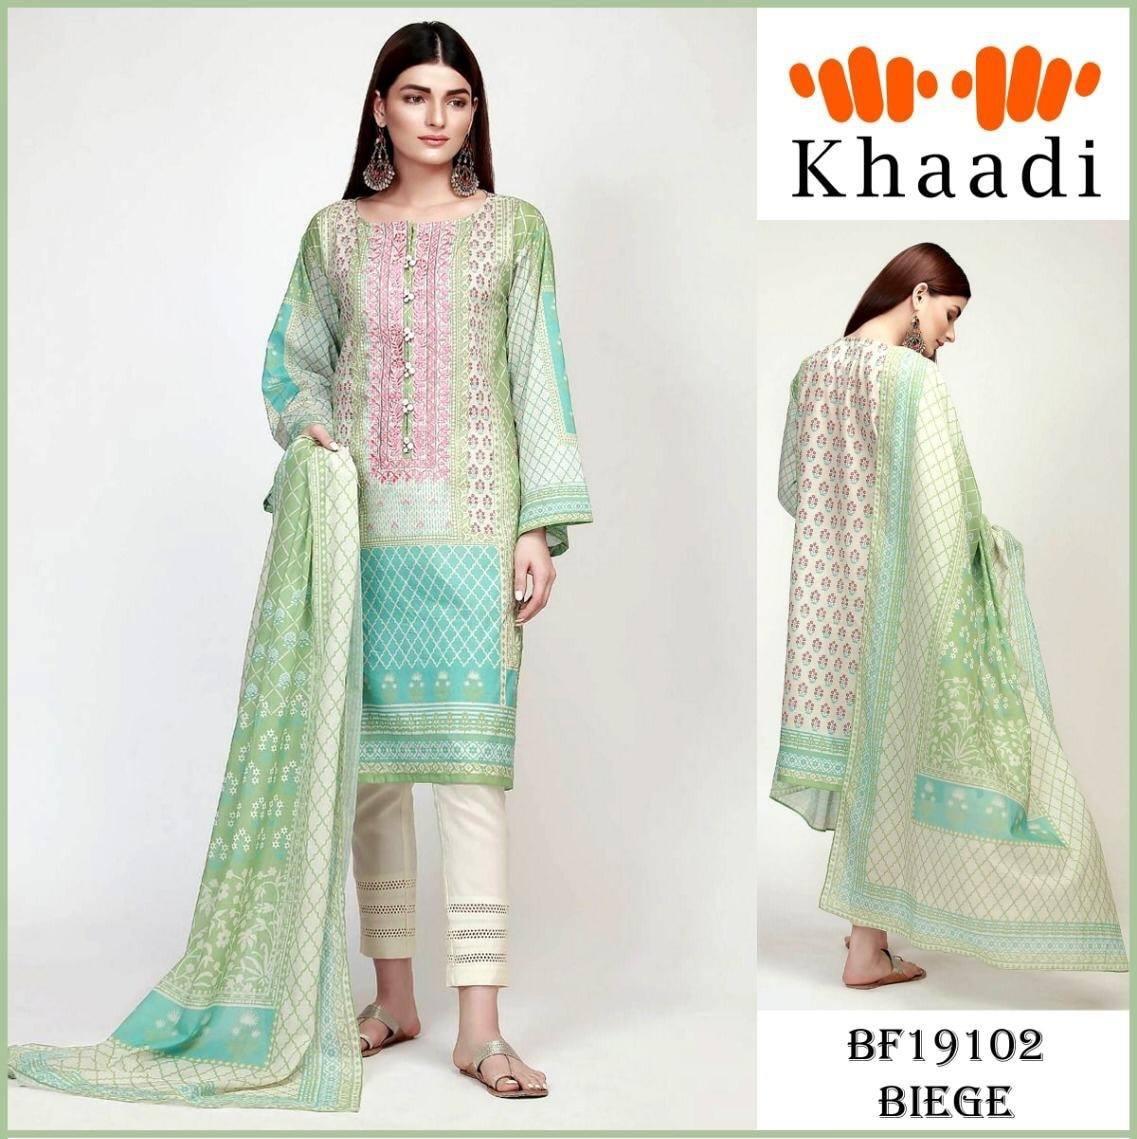 37fd5ead64 Brand Khaadi Embroidered 3PC Lawn Dress with Chiffon Dupatta - Unstitched